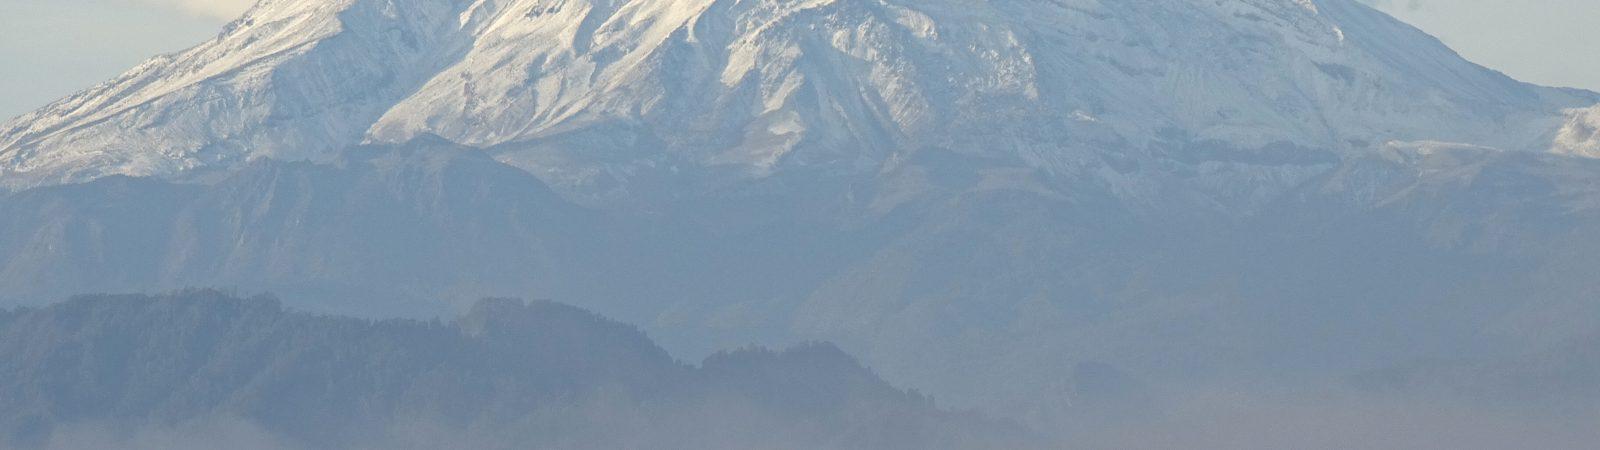 2-day Climbing trip to Pico Orizaba (5636 m)